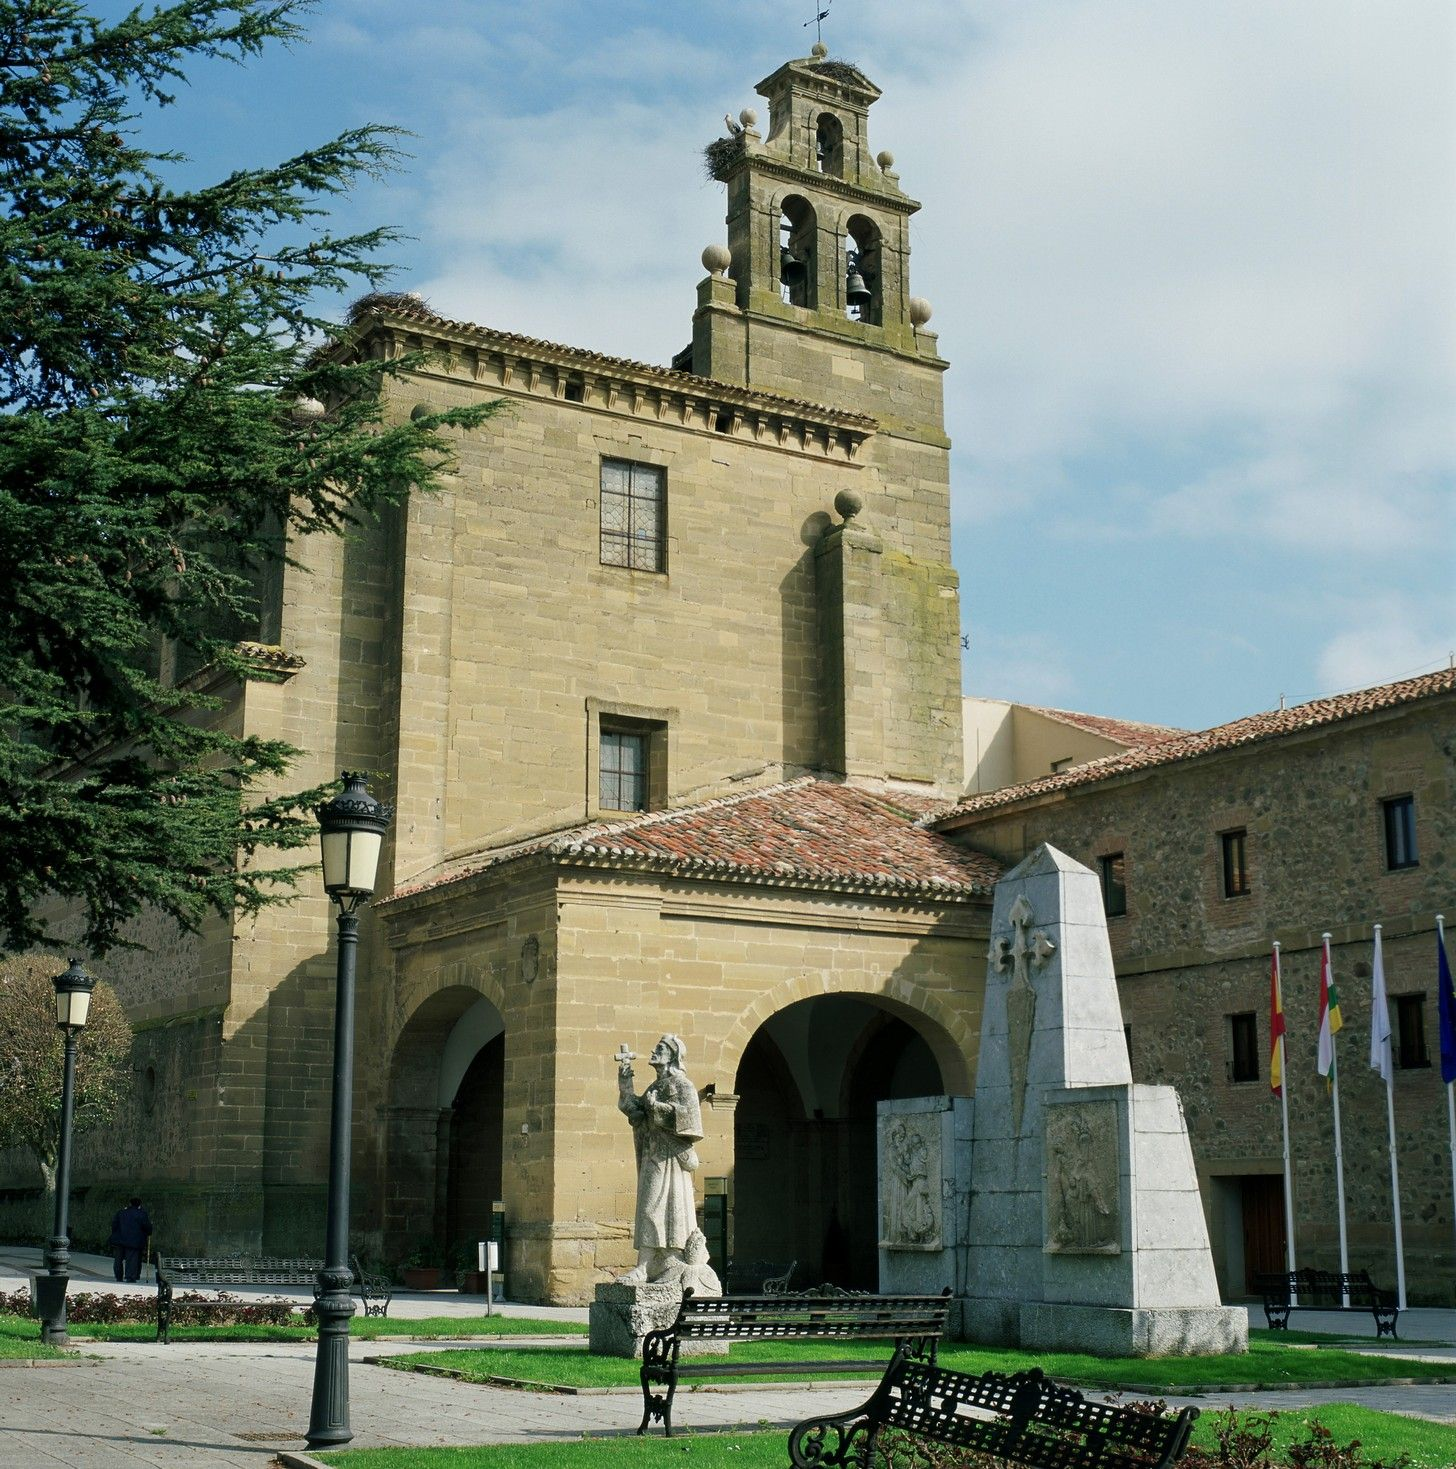 Parador De Santo Domingo Bernardo Rusticchic Bodas Con Encanto Santo Domingo Edificios Artista Grafico